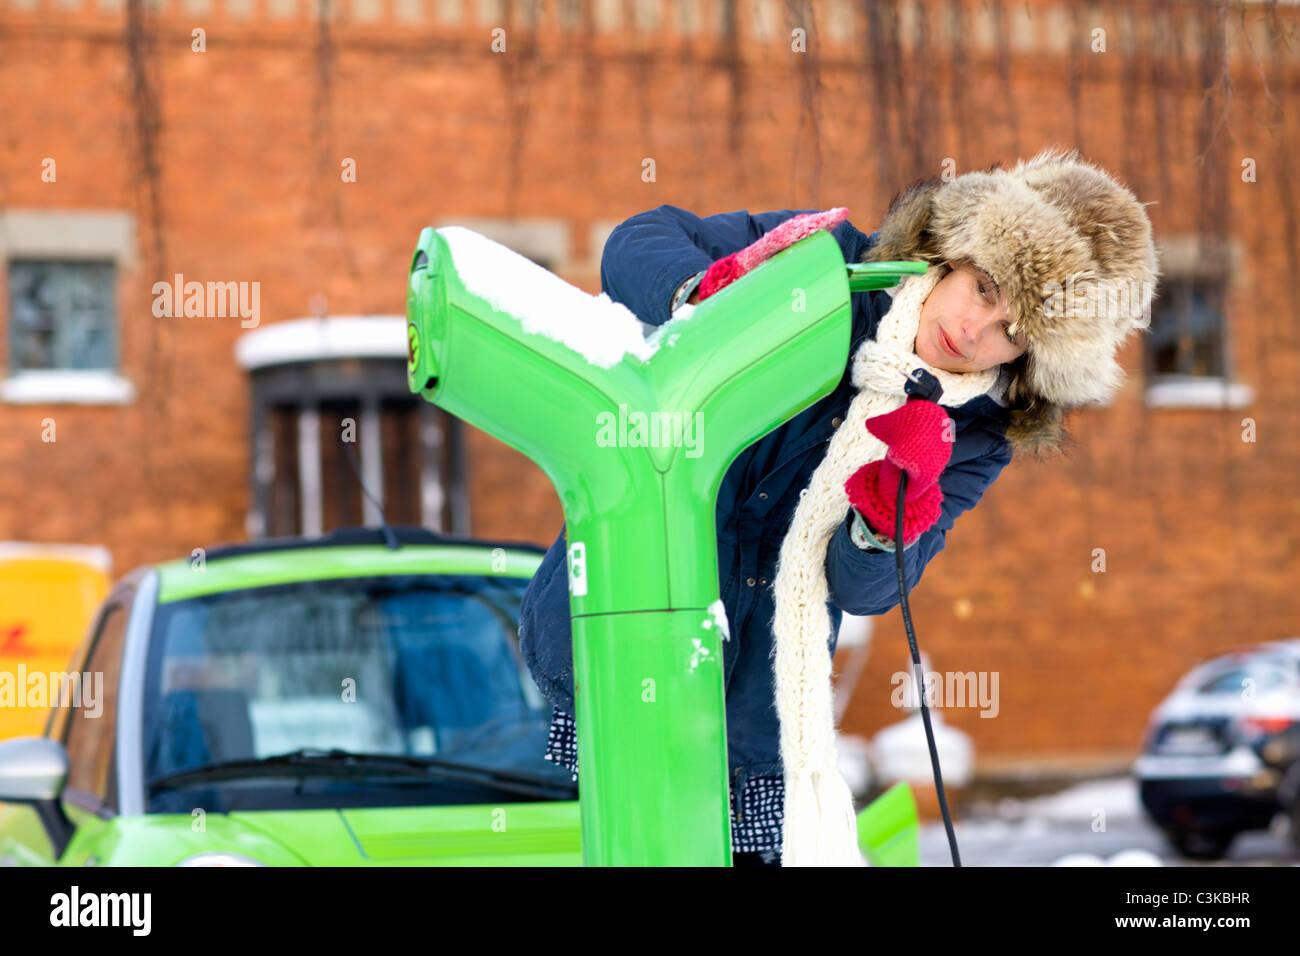 Mujer joven coche eléctrico de carga Imagen De Stock